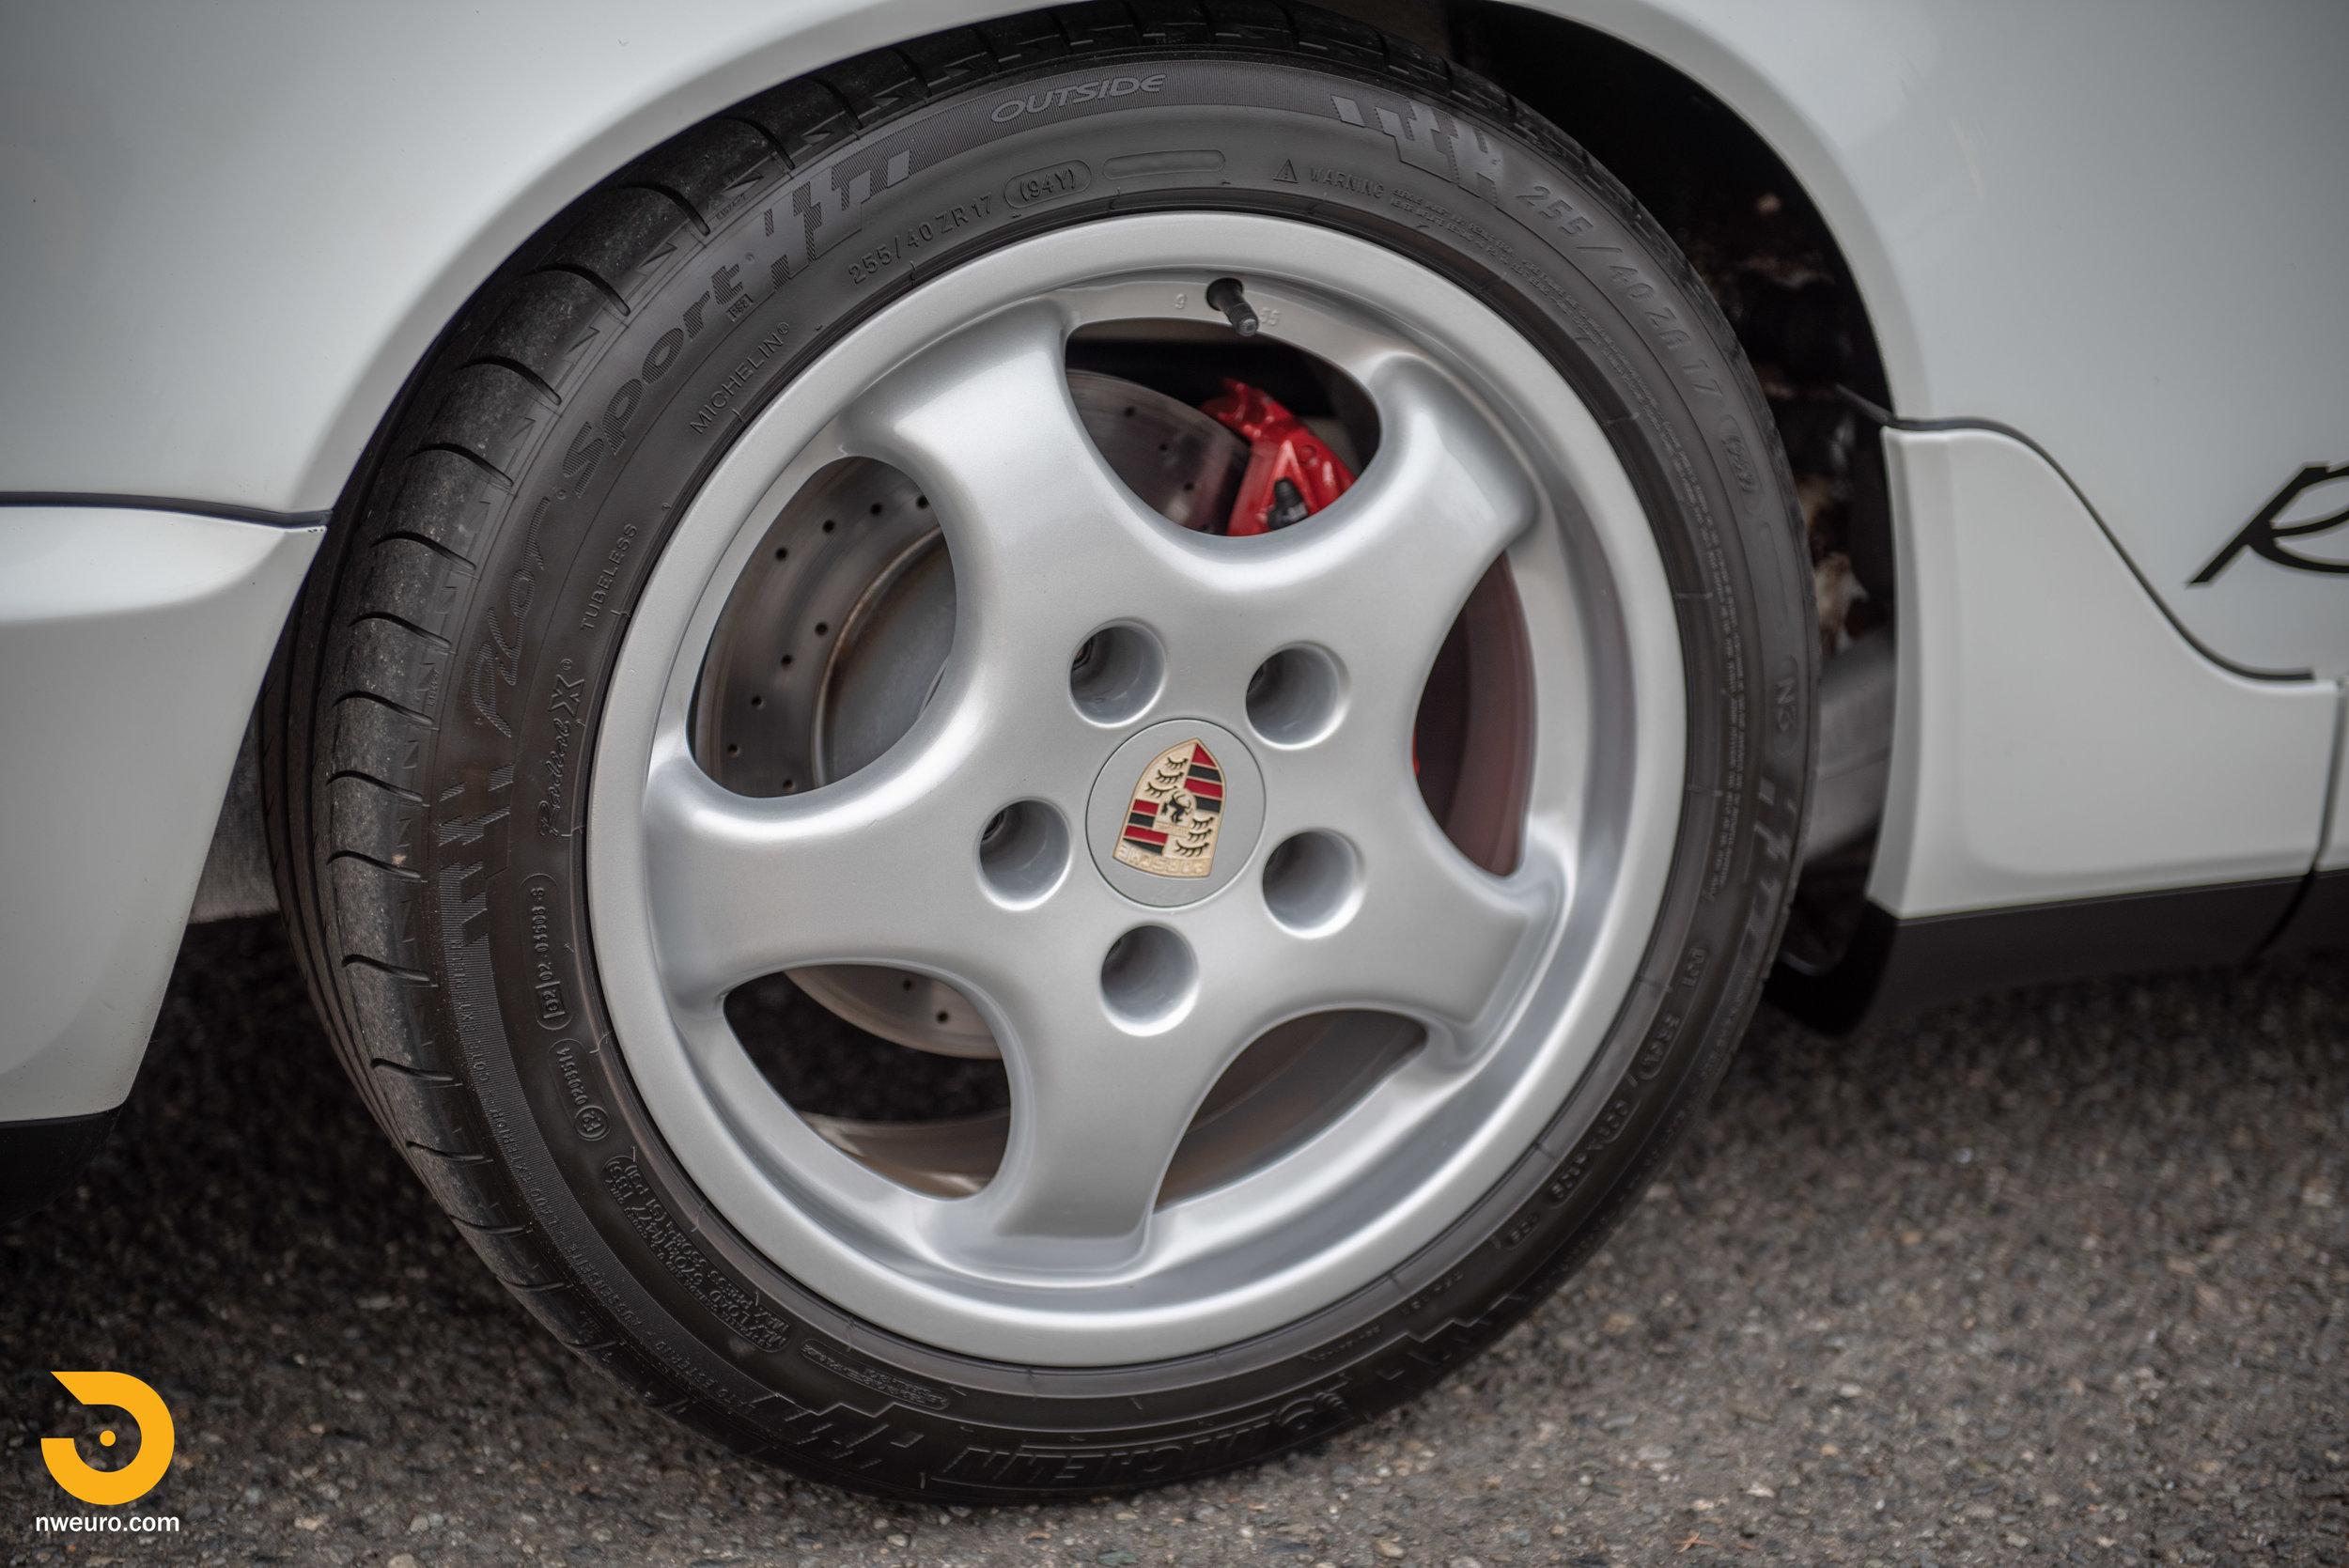 1993 Porsche RS America White-25.jpg